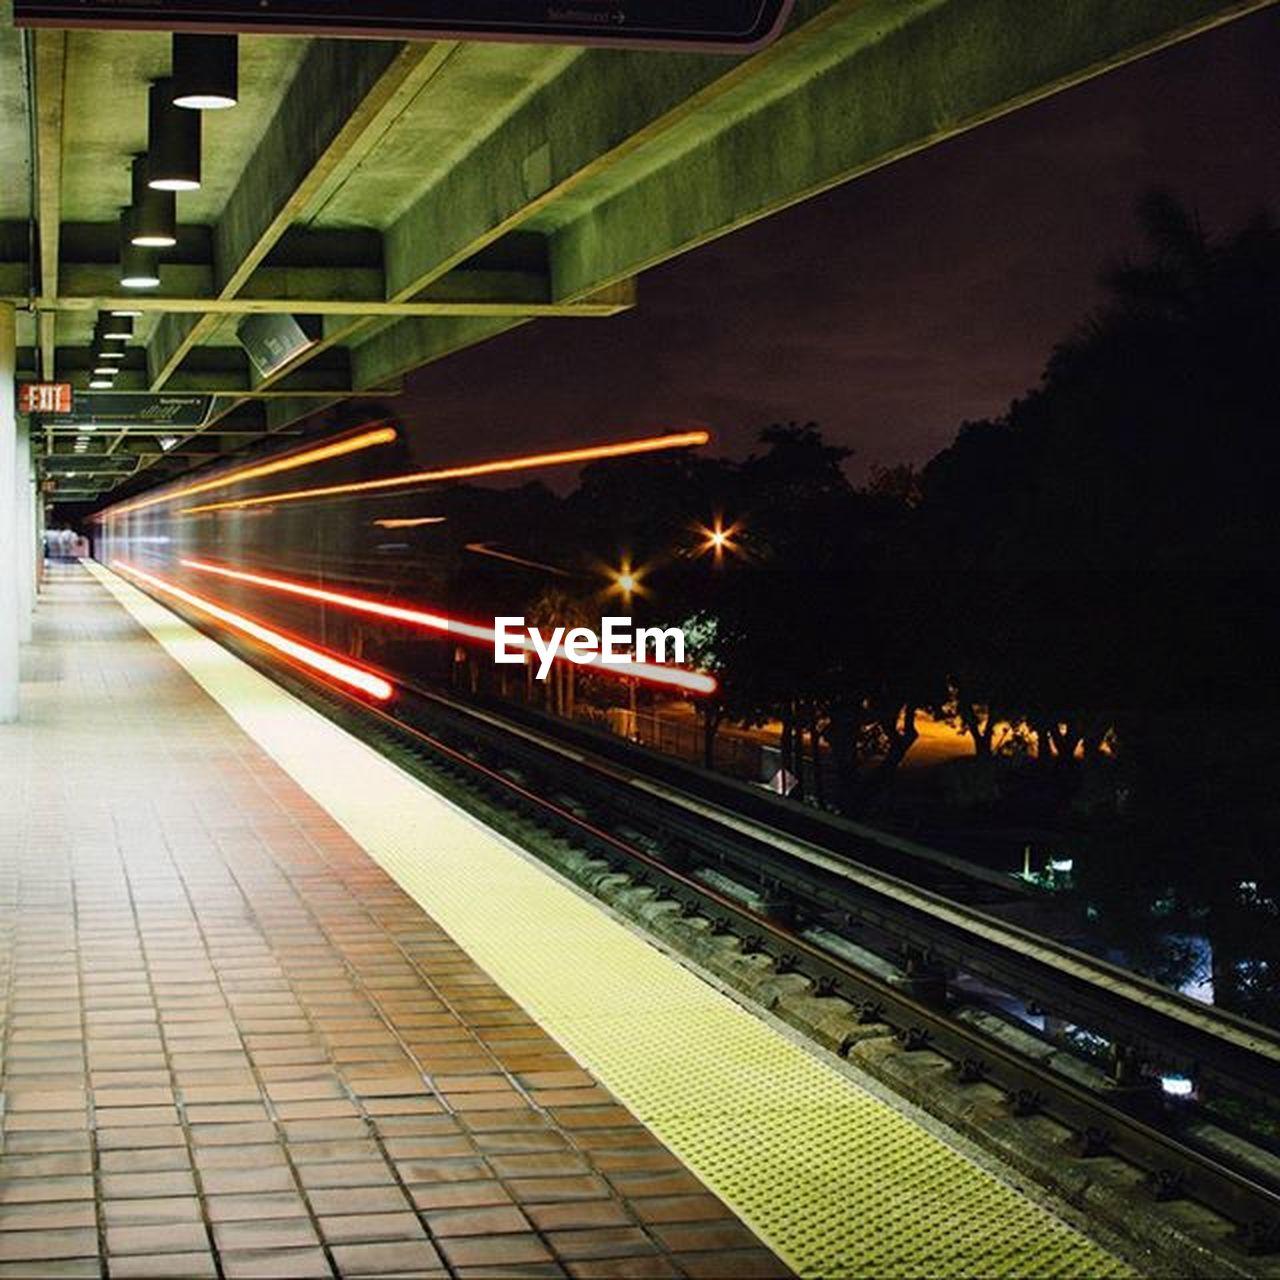 illuminated, railroad track, transportation, night, rail transportation, railroad station platform, railroad station, public transportation, no people, indoors, subway train, architecture, tree, city